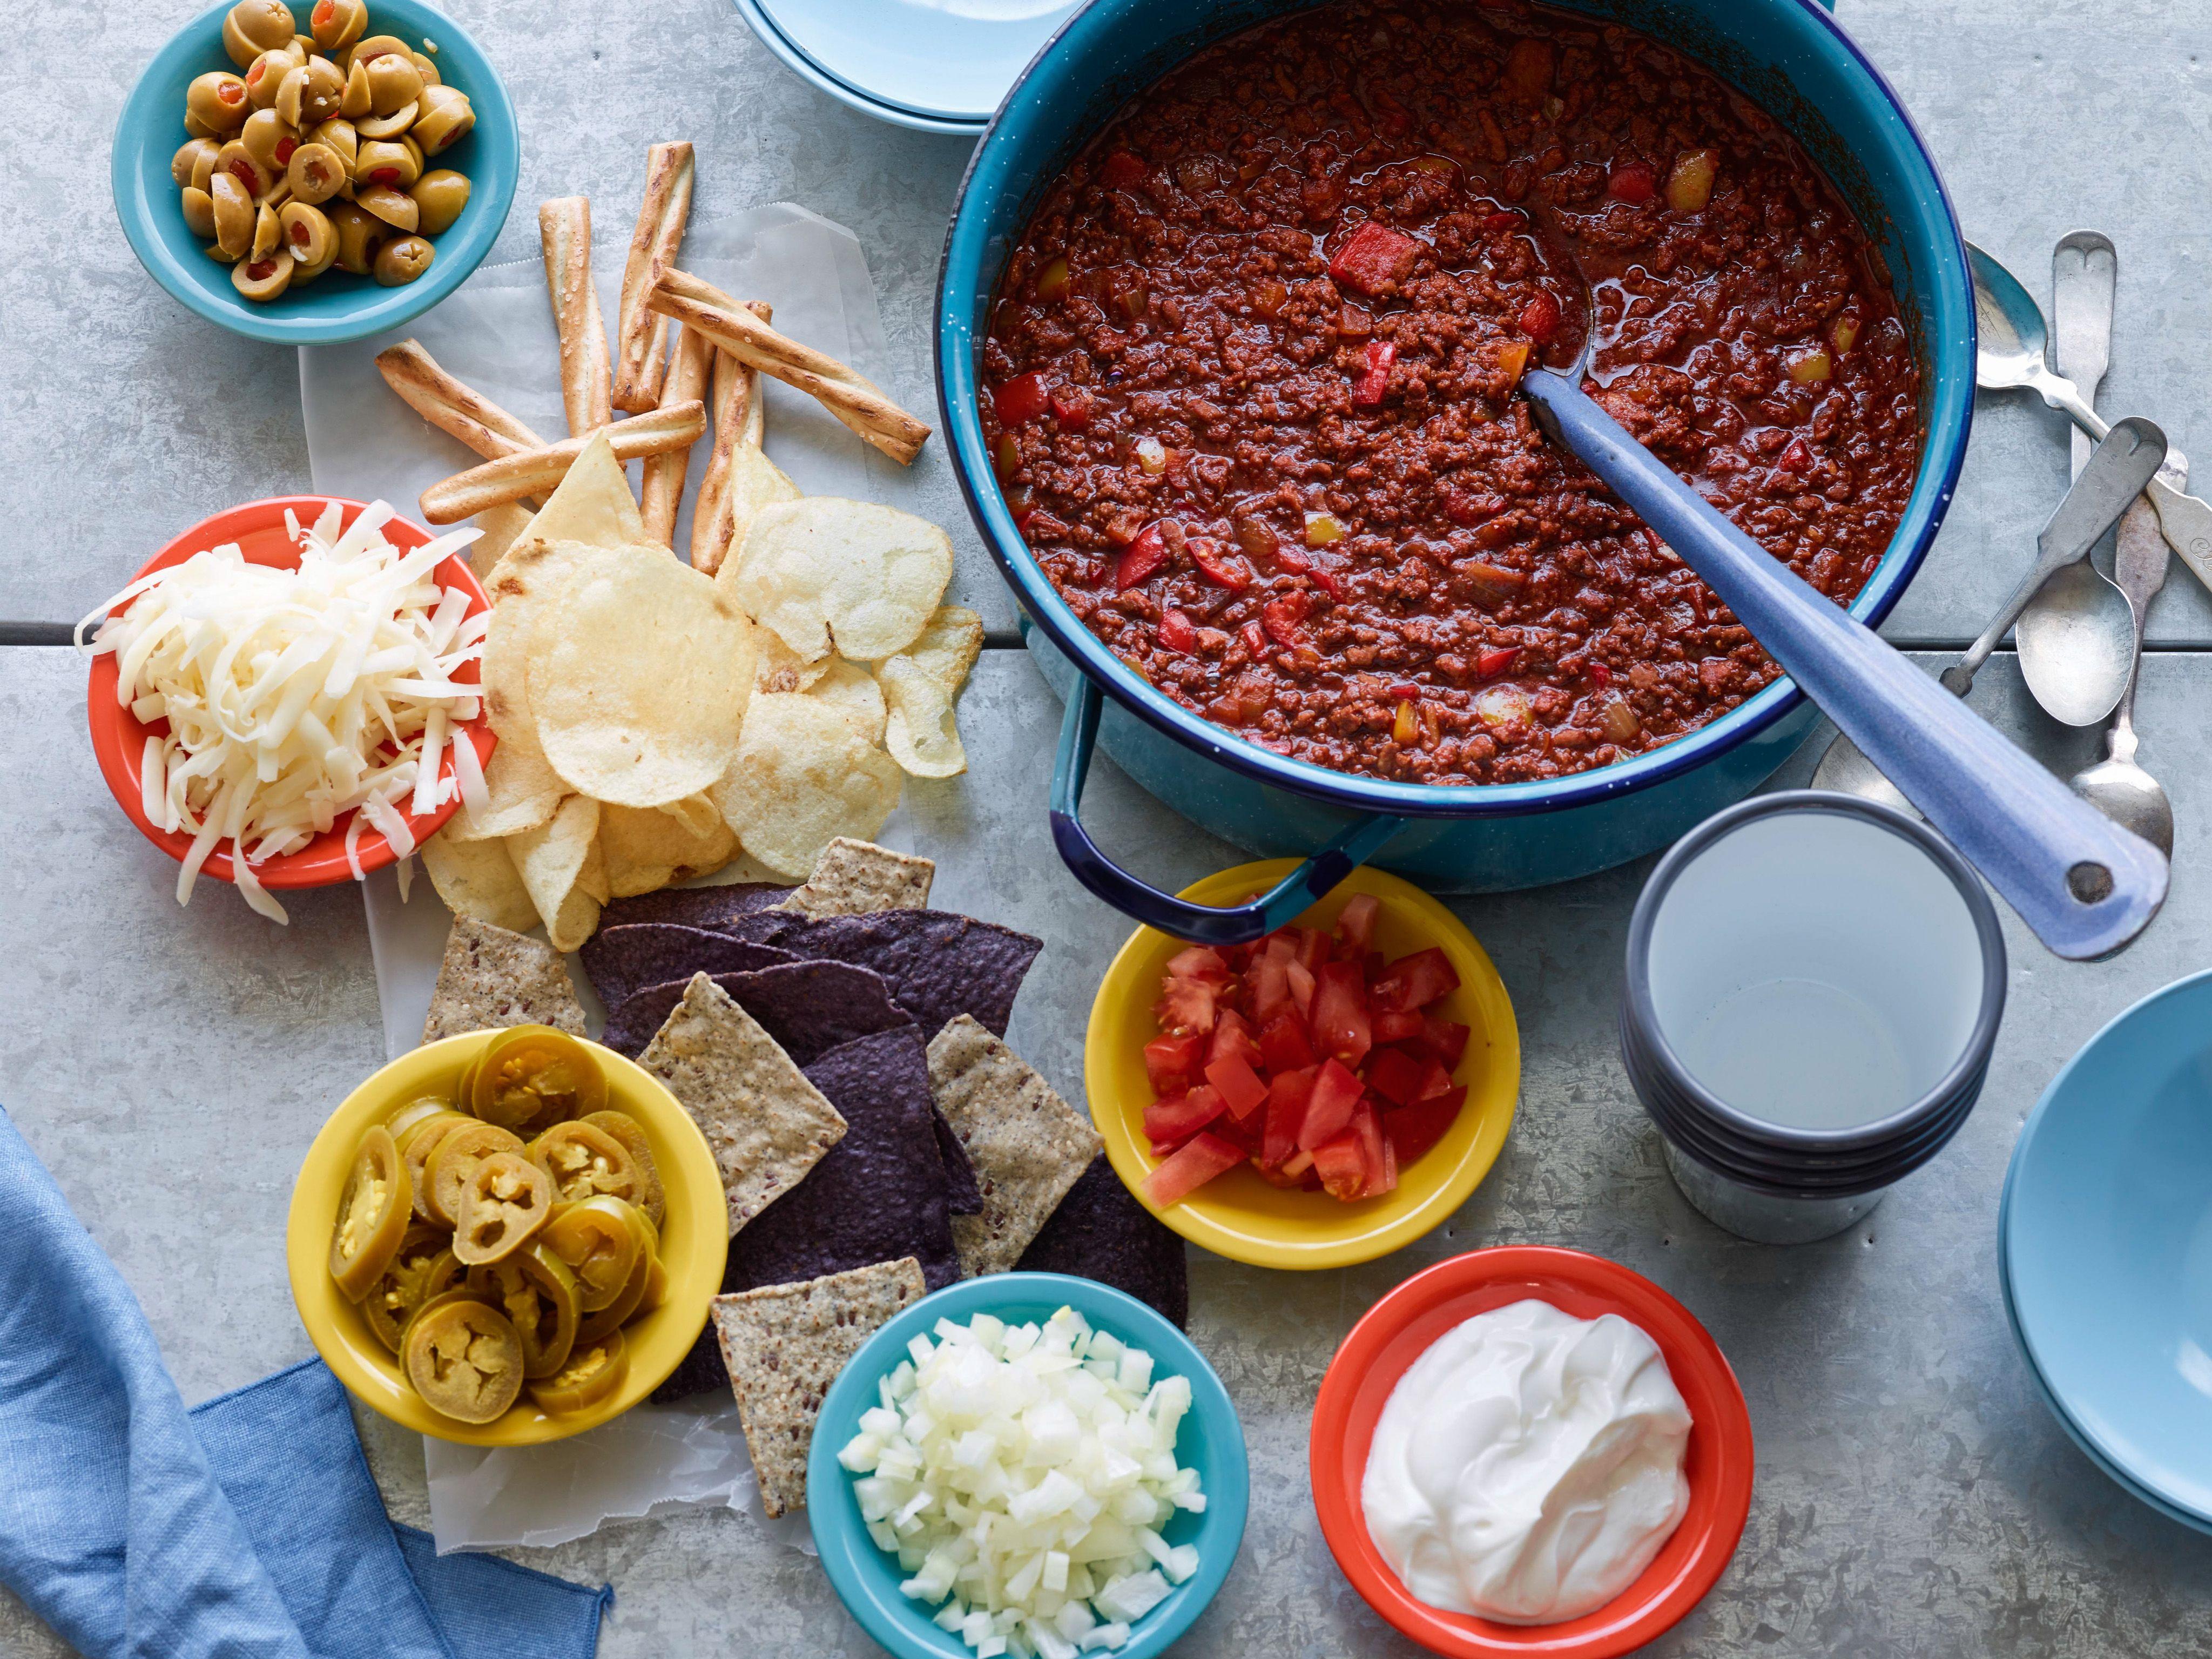 Indian summer turkey chili receta pinterest forumfinder Choice Image